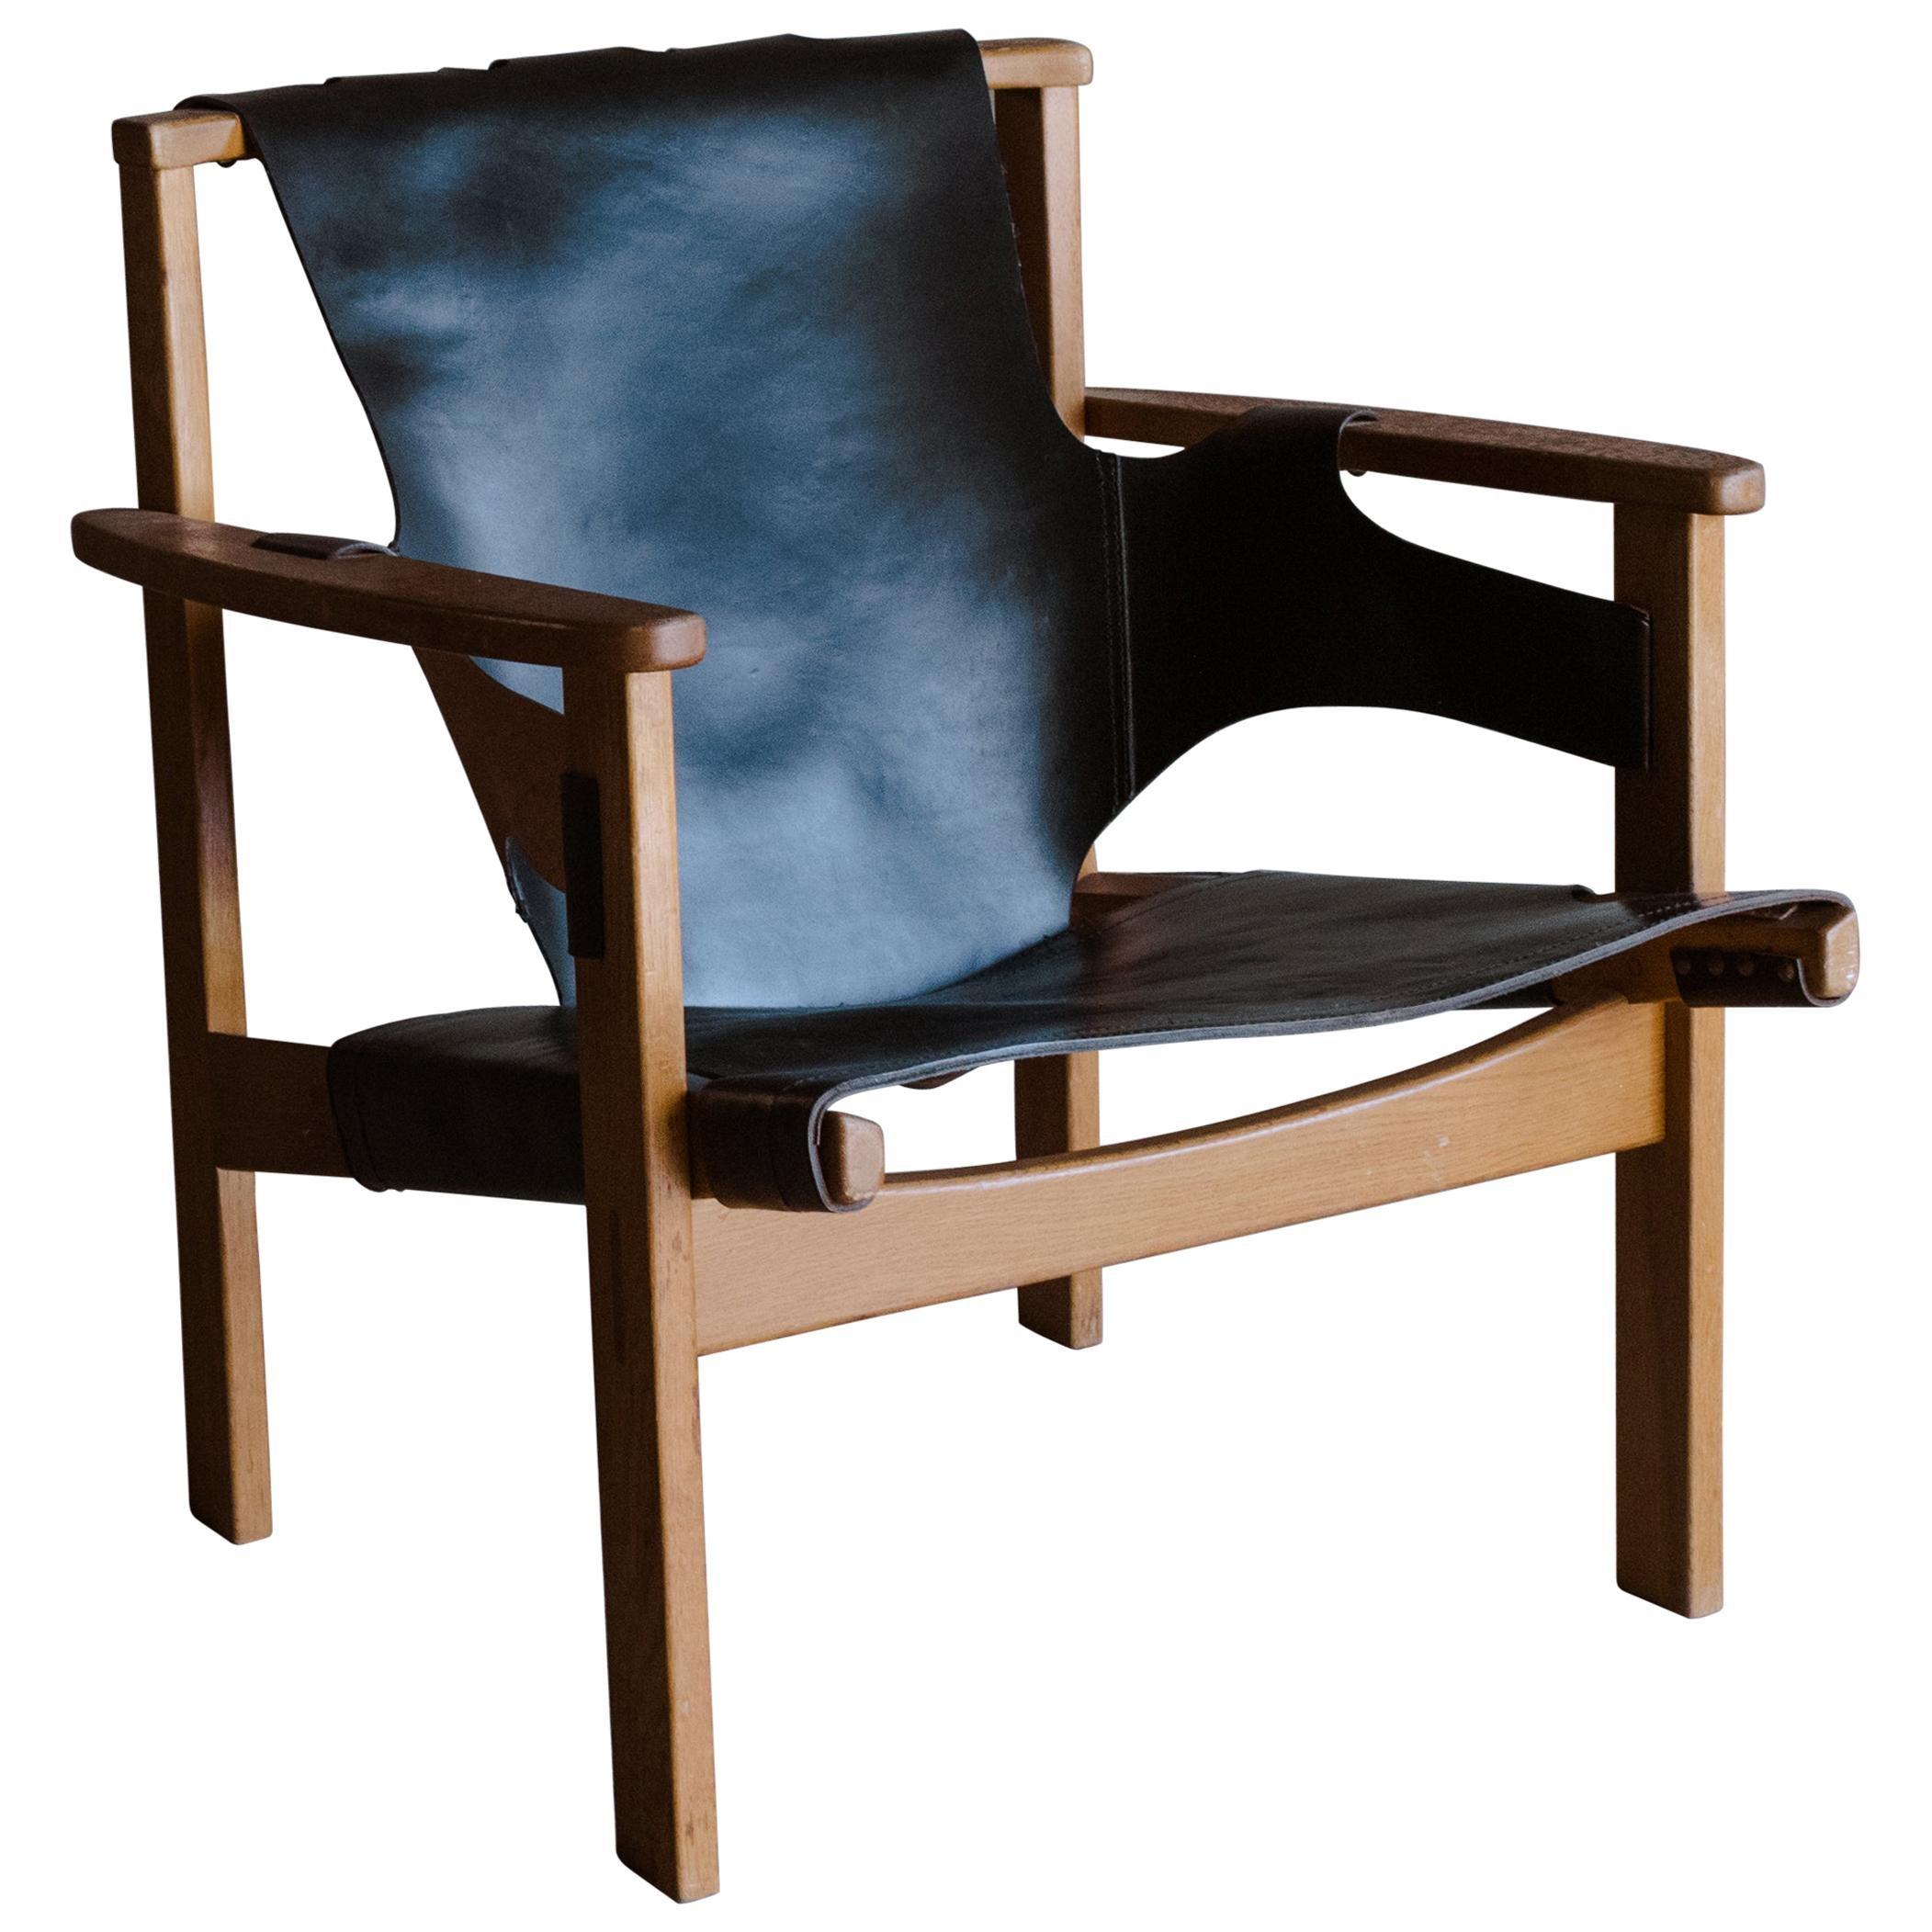 Vintage Carl-Axel Acking Chair for NK 'Nordiska Kompaniet', Model 'Trienna'